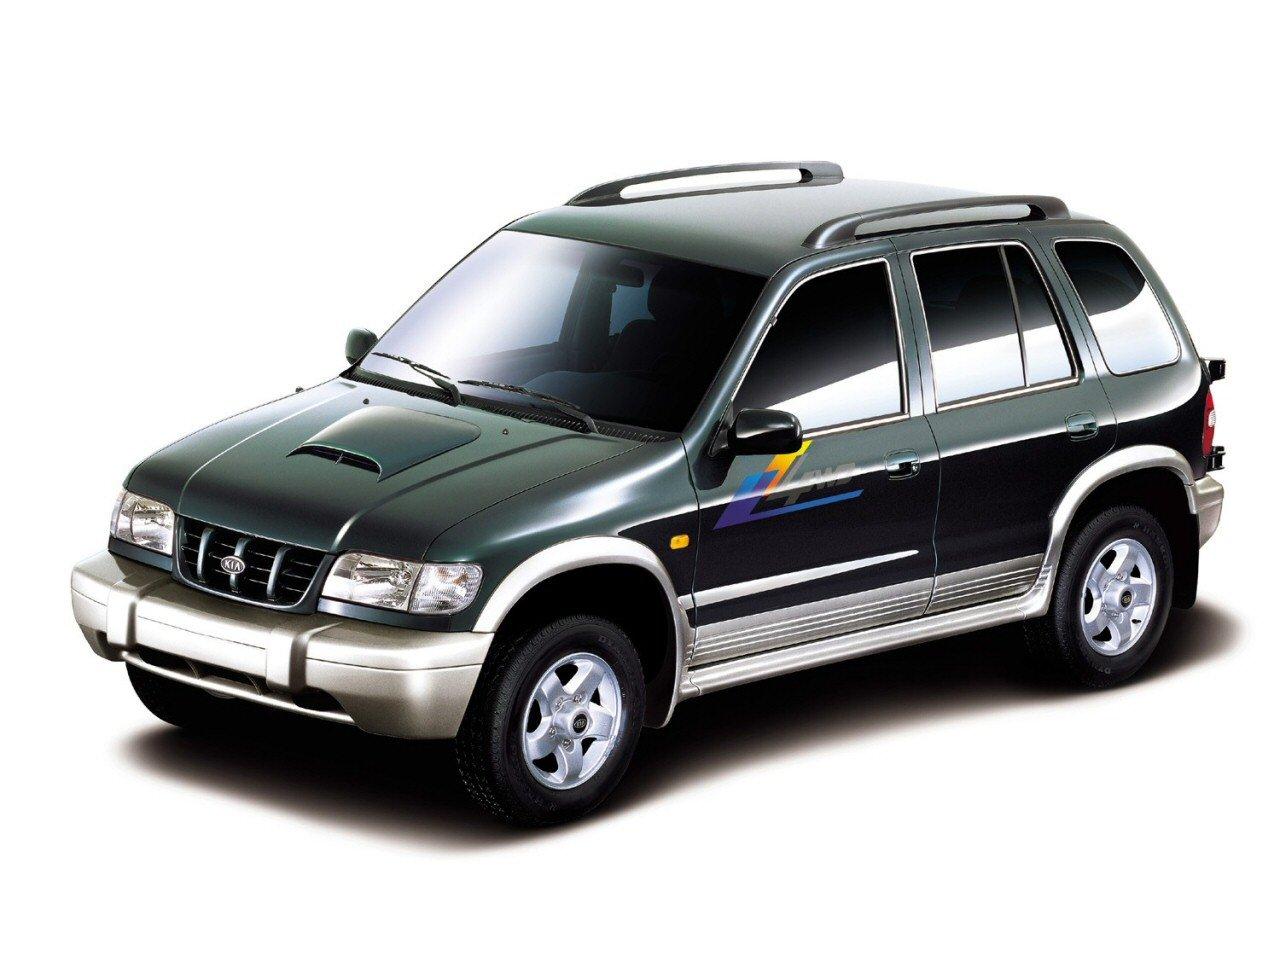 http://img2.autonavigator.ru/carsfoto/1280/3324/40330/KIA_Sportage_SUV%205%20door_1997.jpg